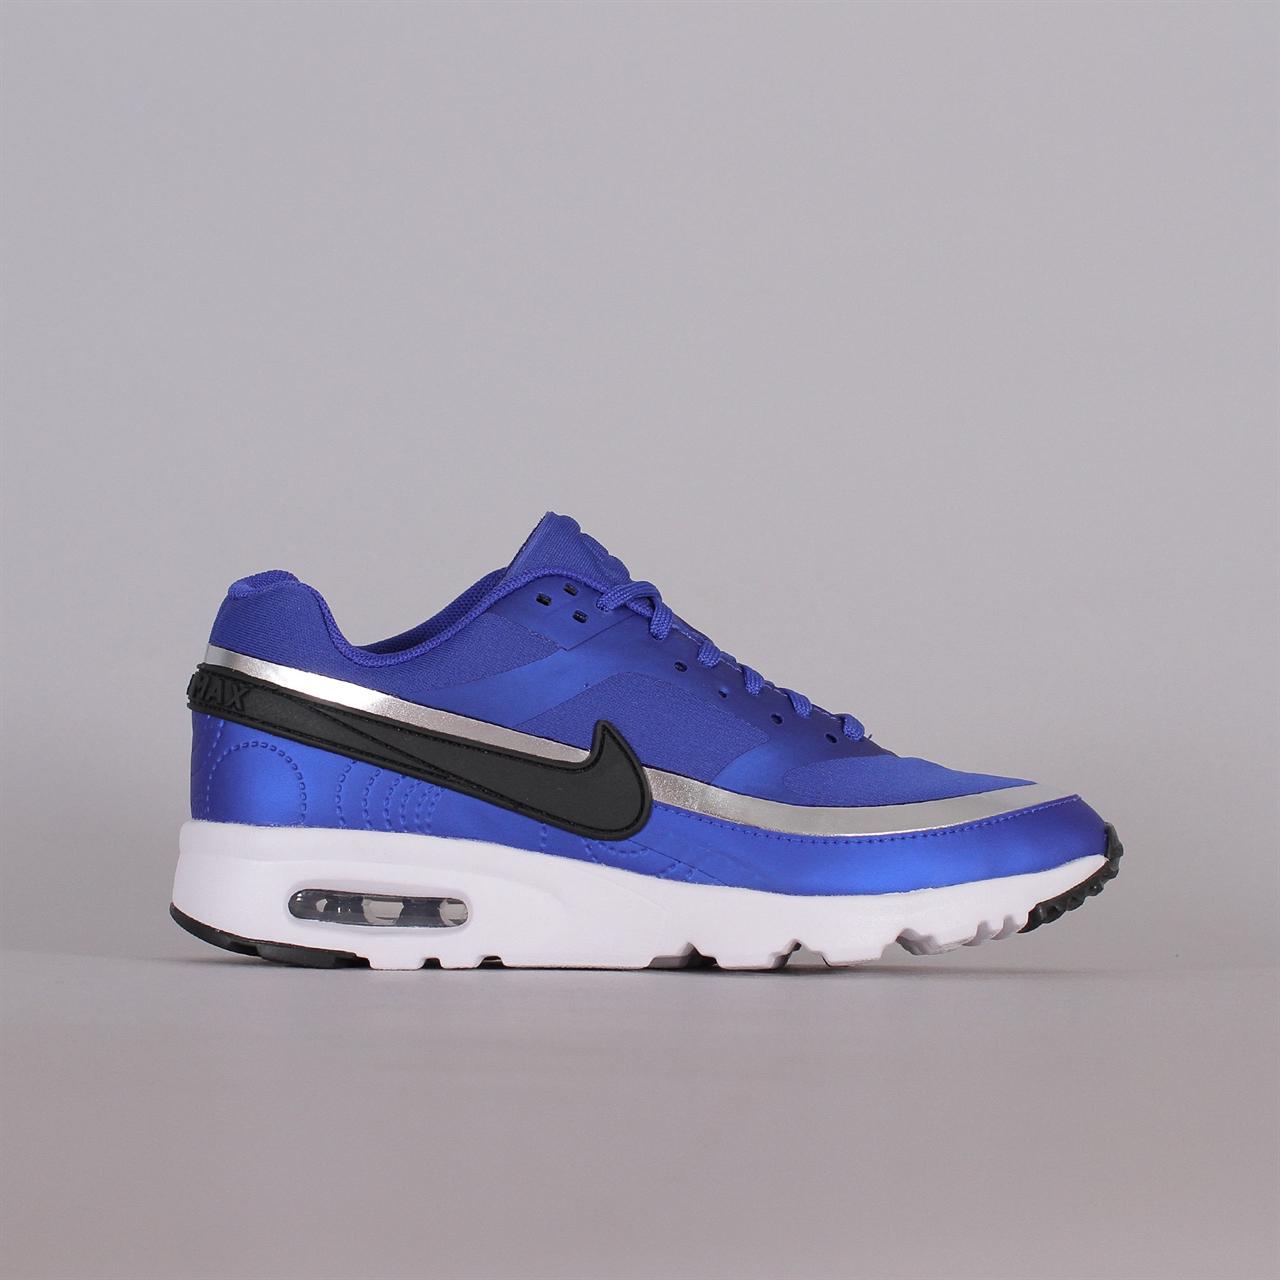 pas cher pour réduction f648a 5a81b Shelta - Nike Sportswear Womens Air Max BW Ultra